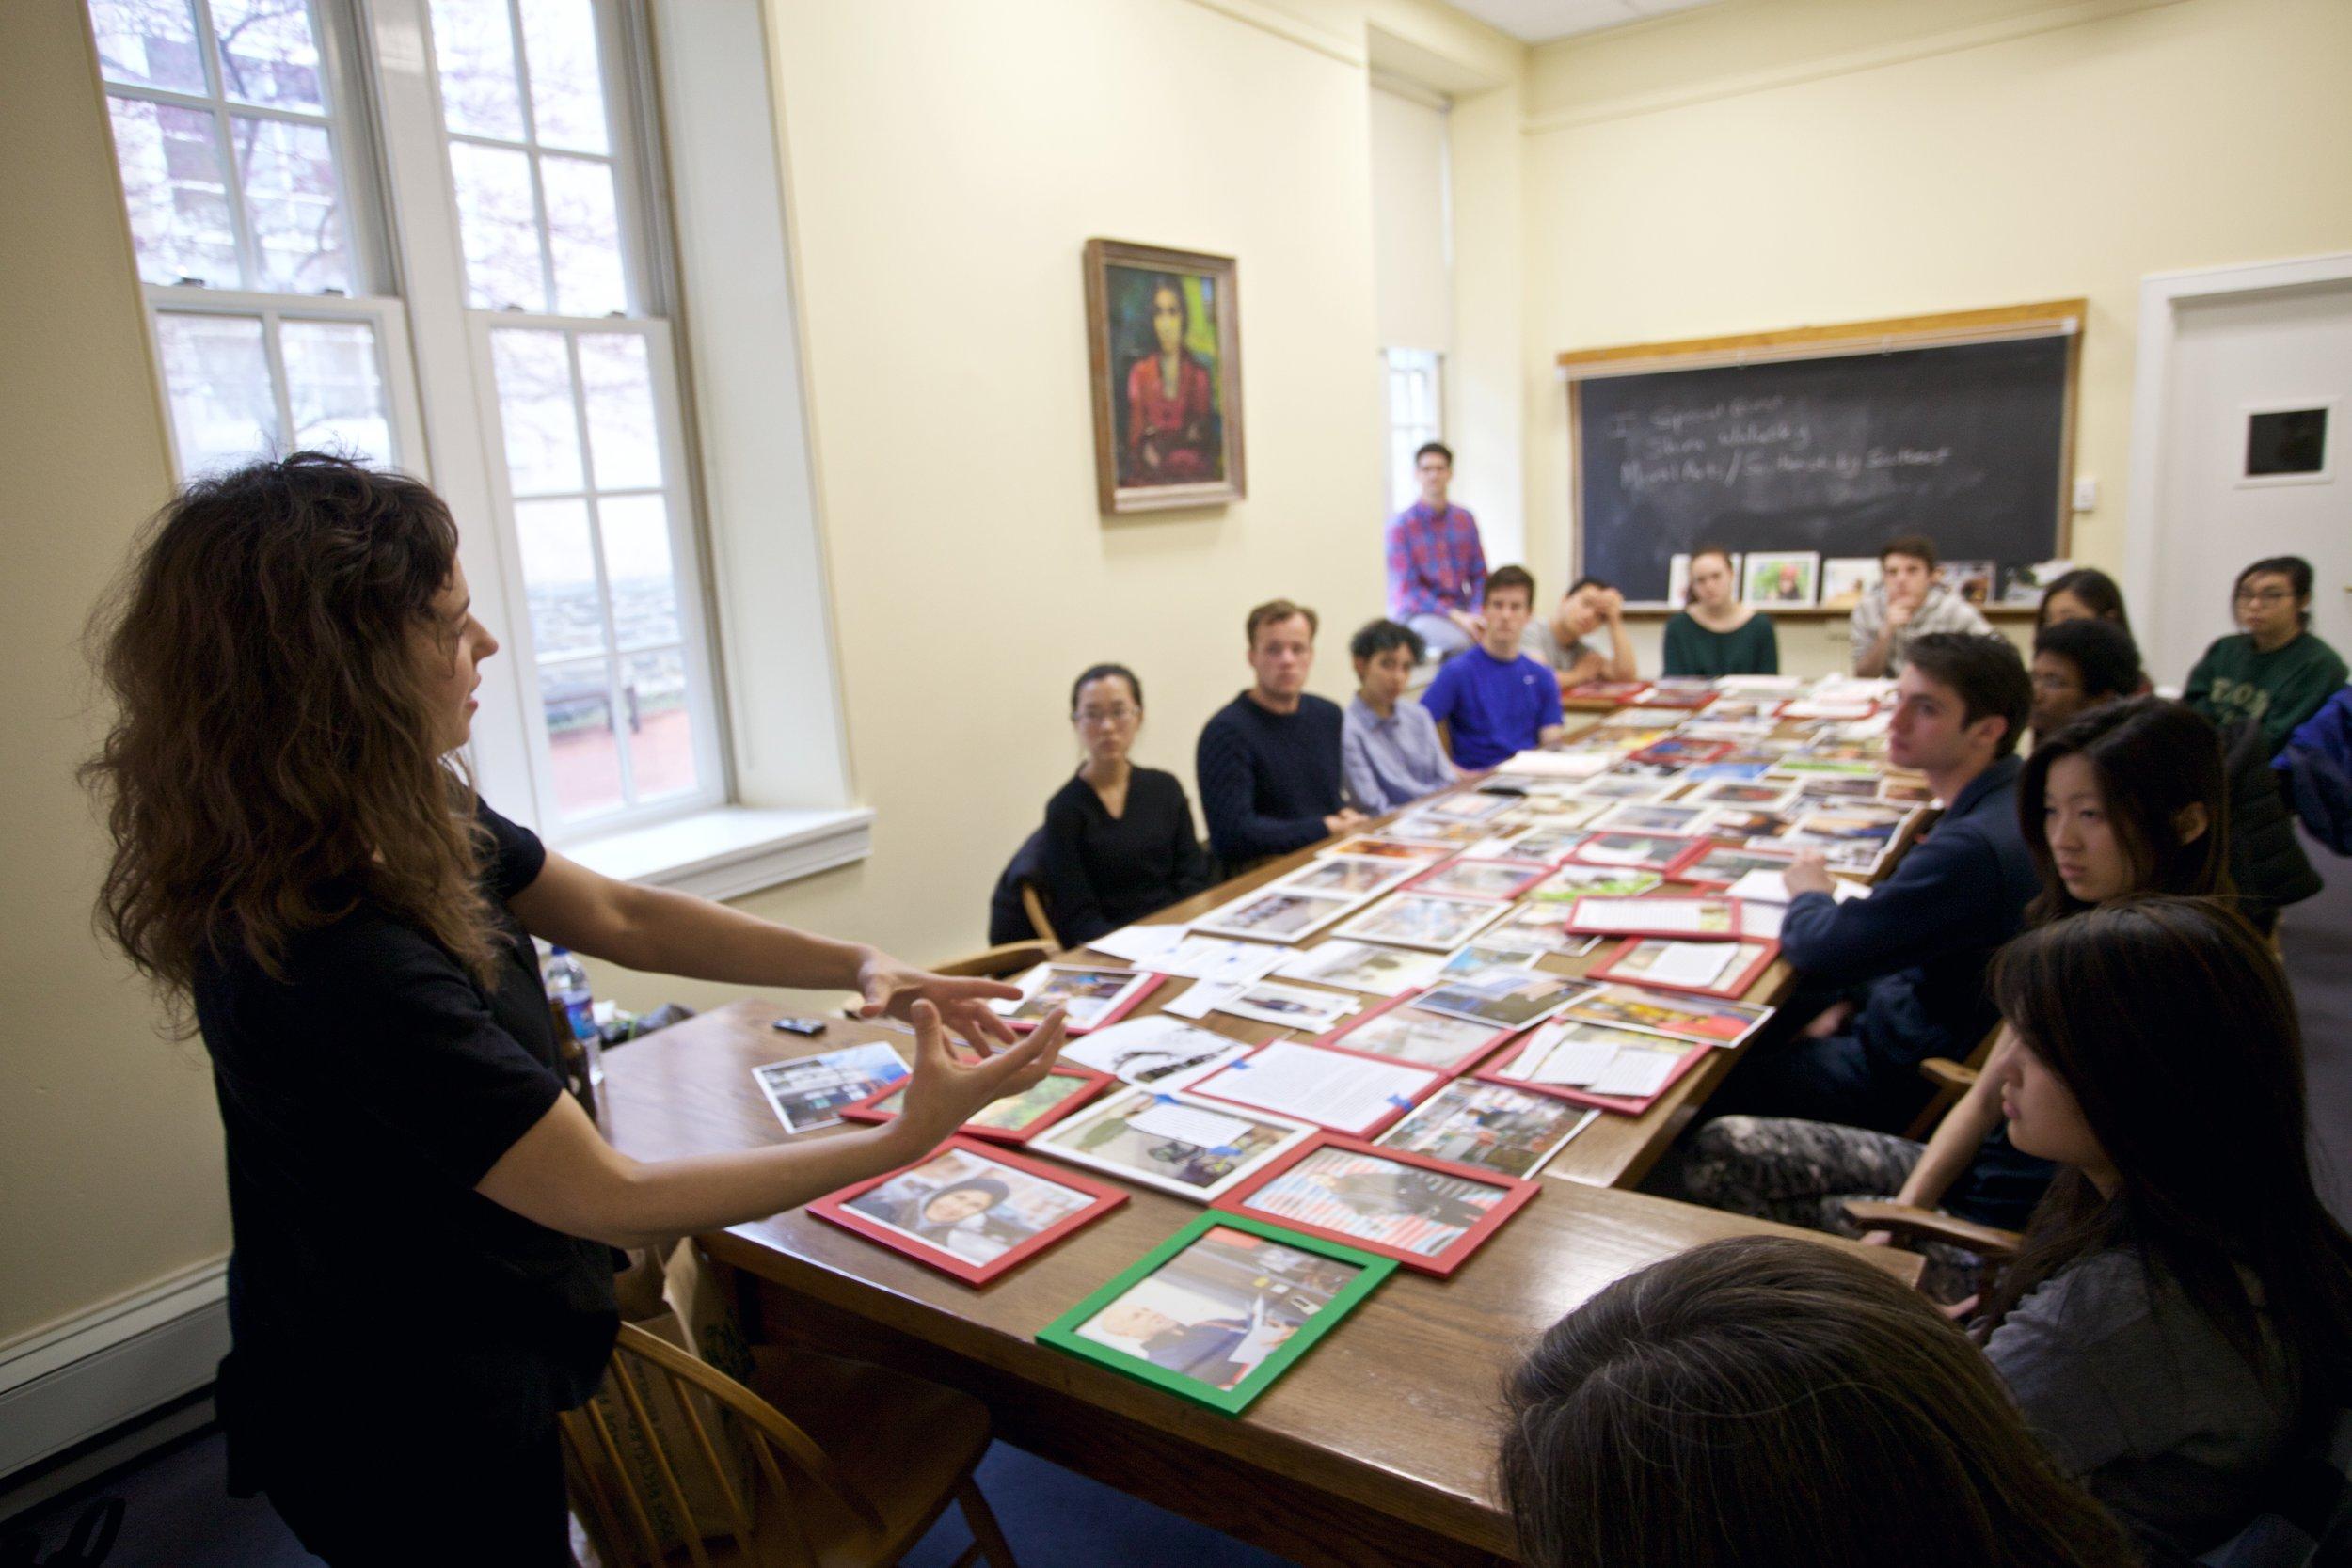 Philadelphia Freedoms: Artist Shira Walinsky Class Visit (Photo by Caleb Eckert)